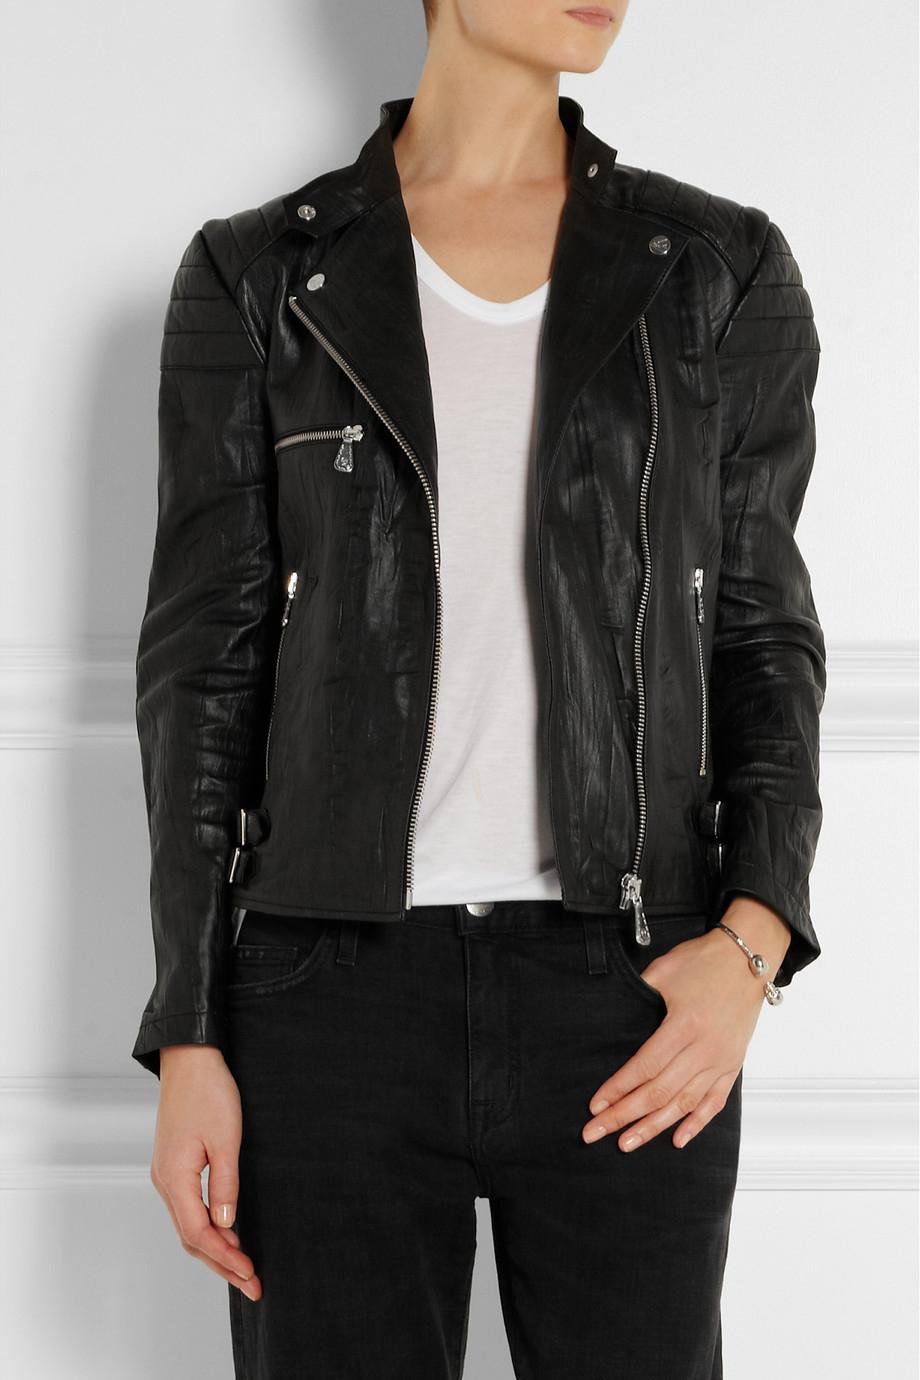 333068c59dfab McQ Crinkled-leather Biker Jacket in Black - Lyst